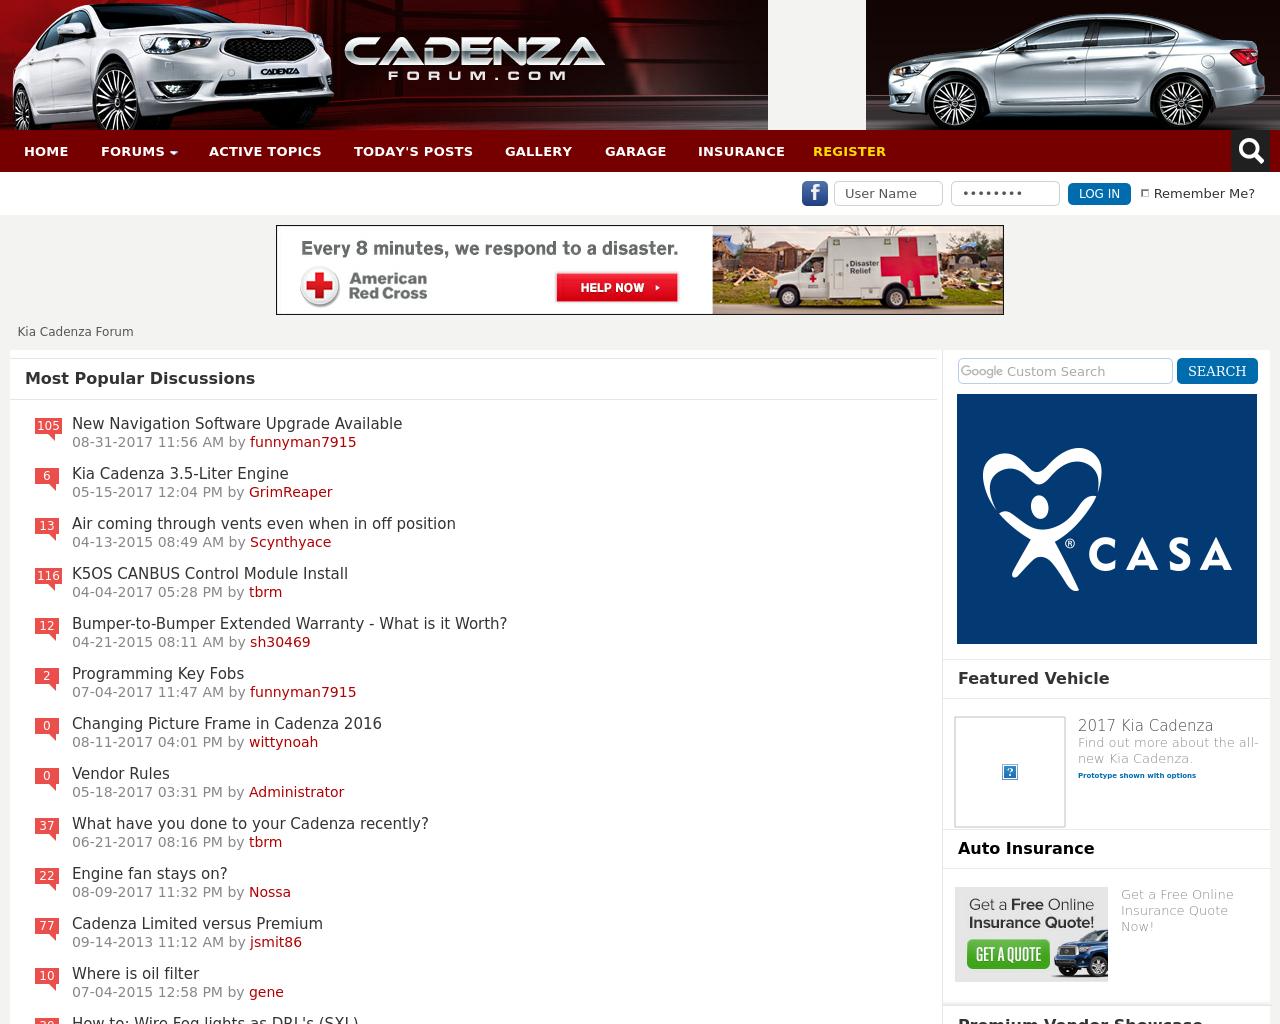 Cadenza-Forum-Advertising-Reviews-Pricing